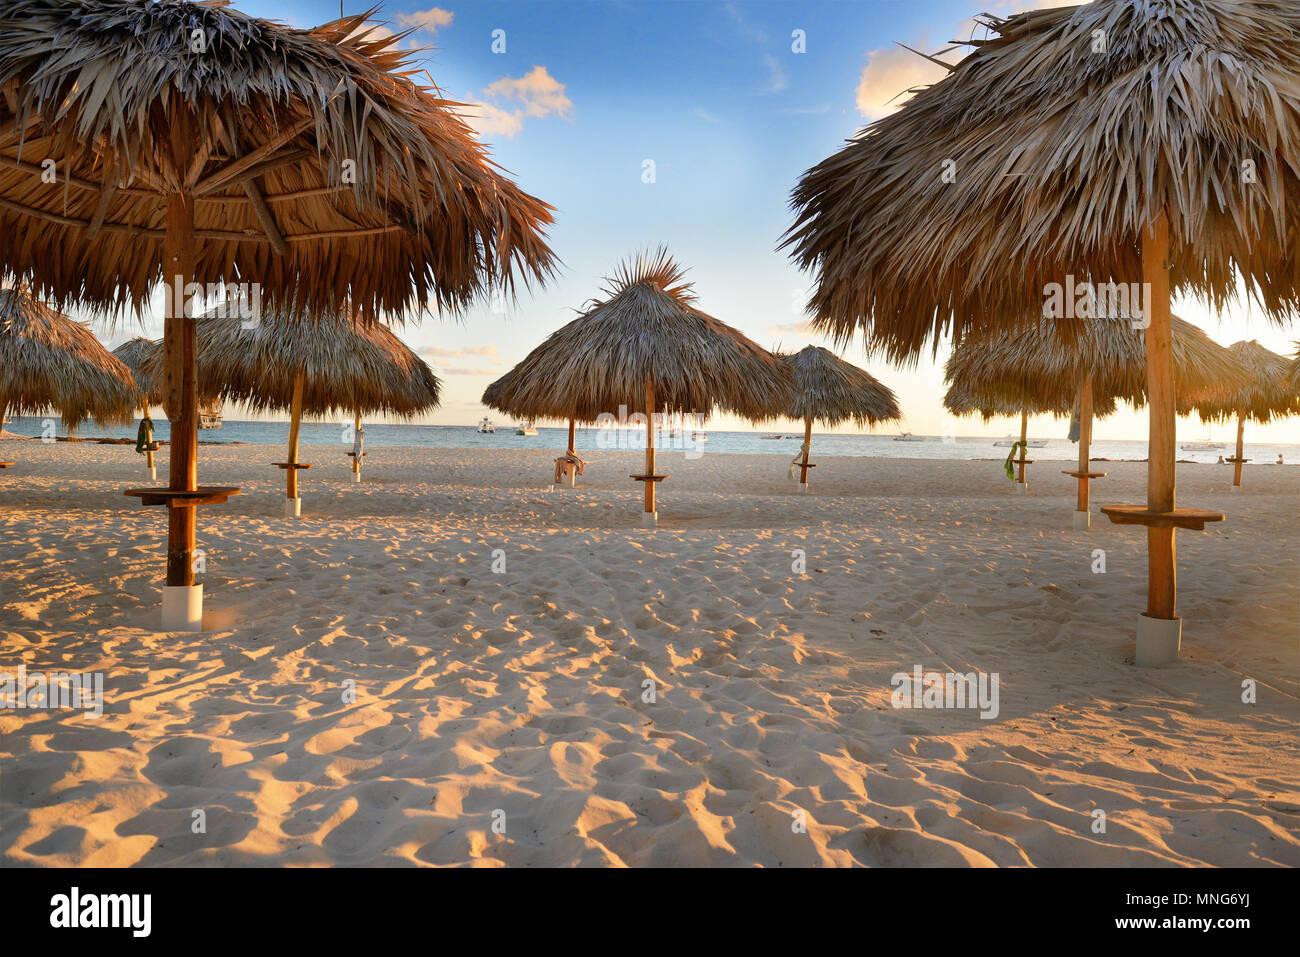 Amazing tropical holidays. Sun umbrellas on the beach. Tropical paradise. Caribbean. Punta Cana. Dominican Republic - Stock Image